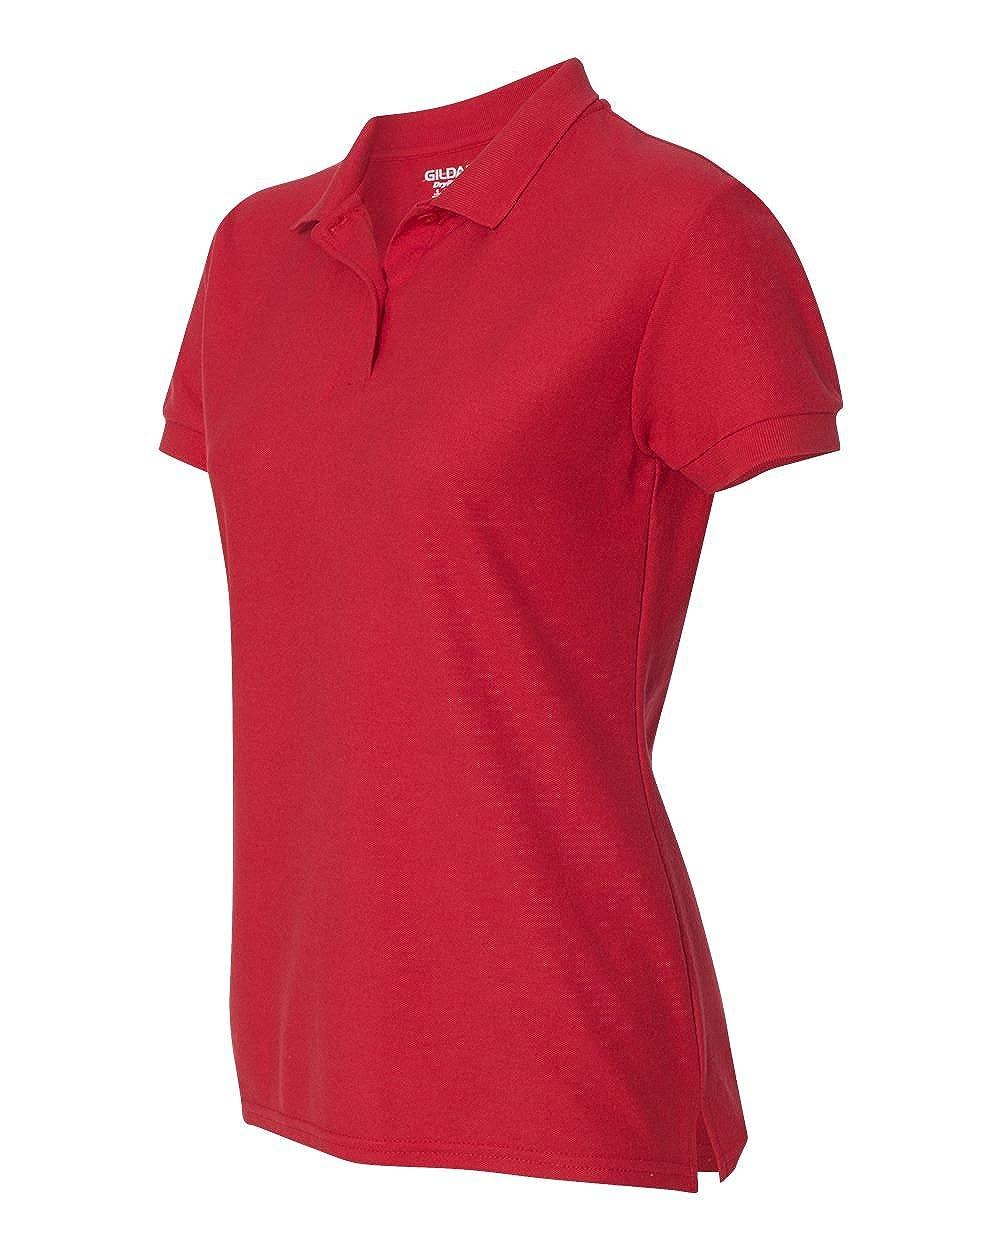 Gildan - Ladies DryBlend Double Pique Polo Shirt - 72800L-Red-XL ...